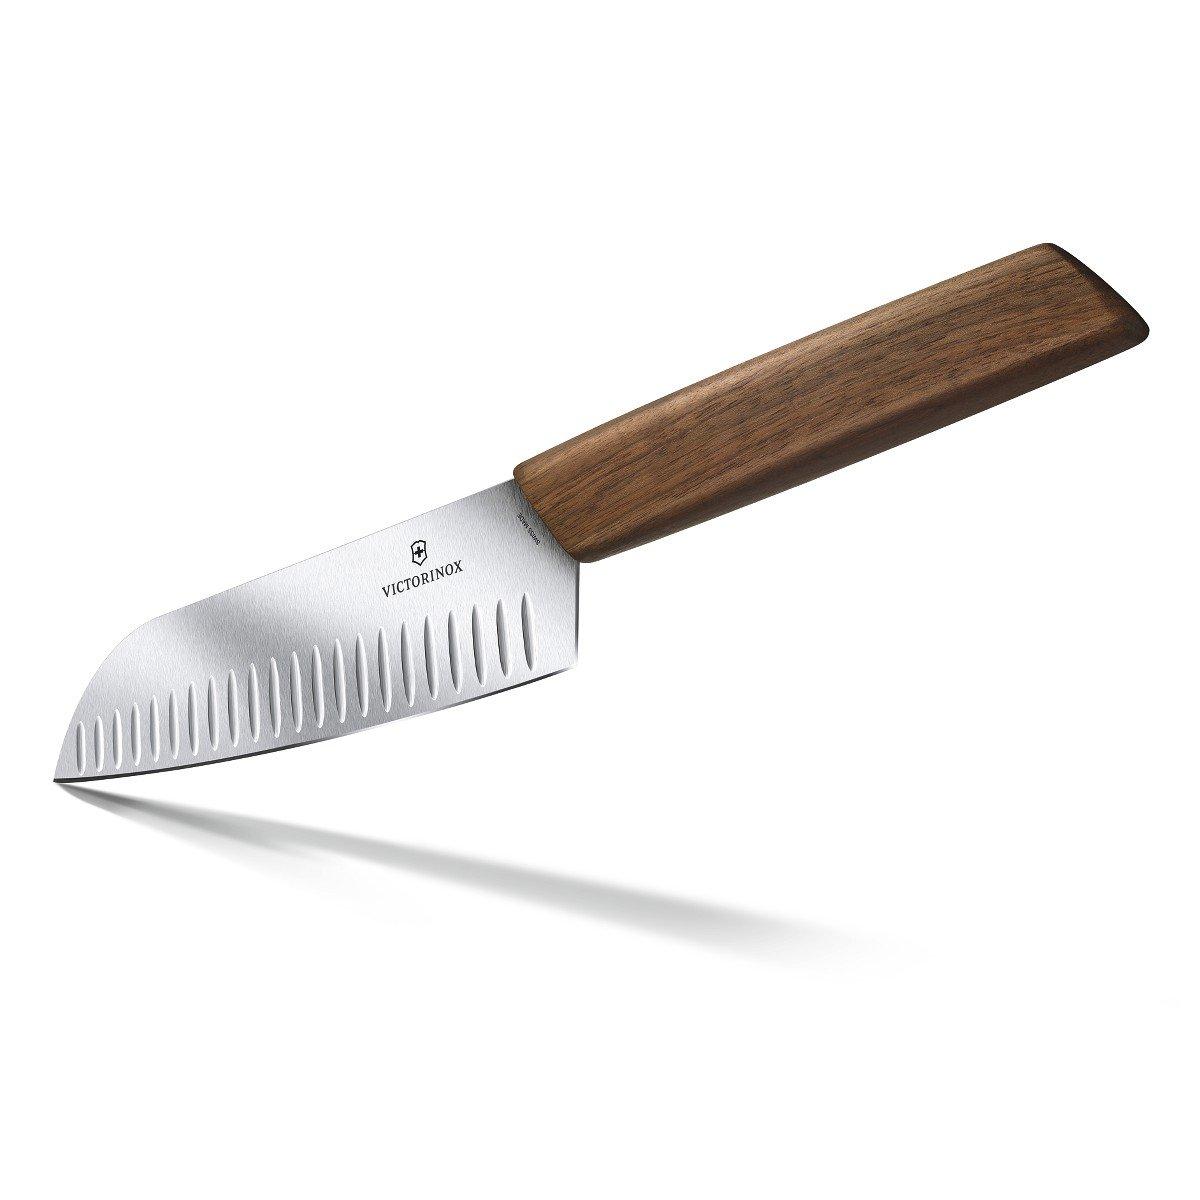 Victorinox 6.9050.17KG Modern Santoku Knife, 7'', Walnut Wood by Victorinox (Image #2)